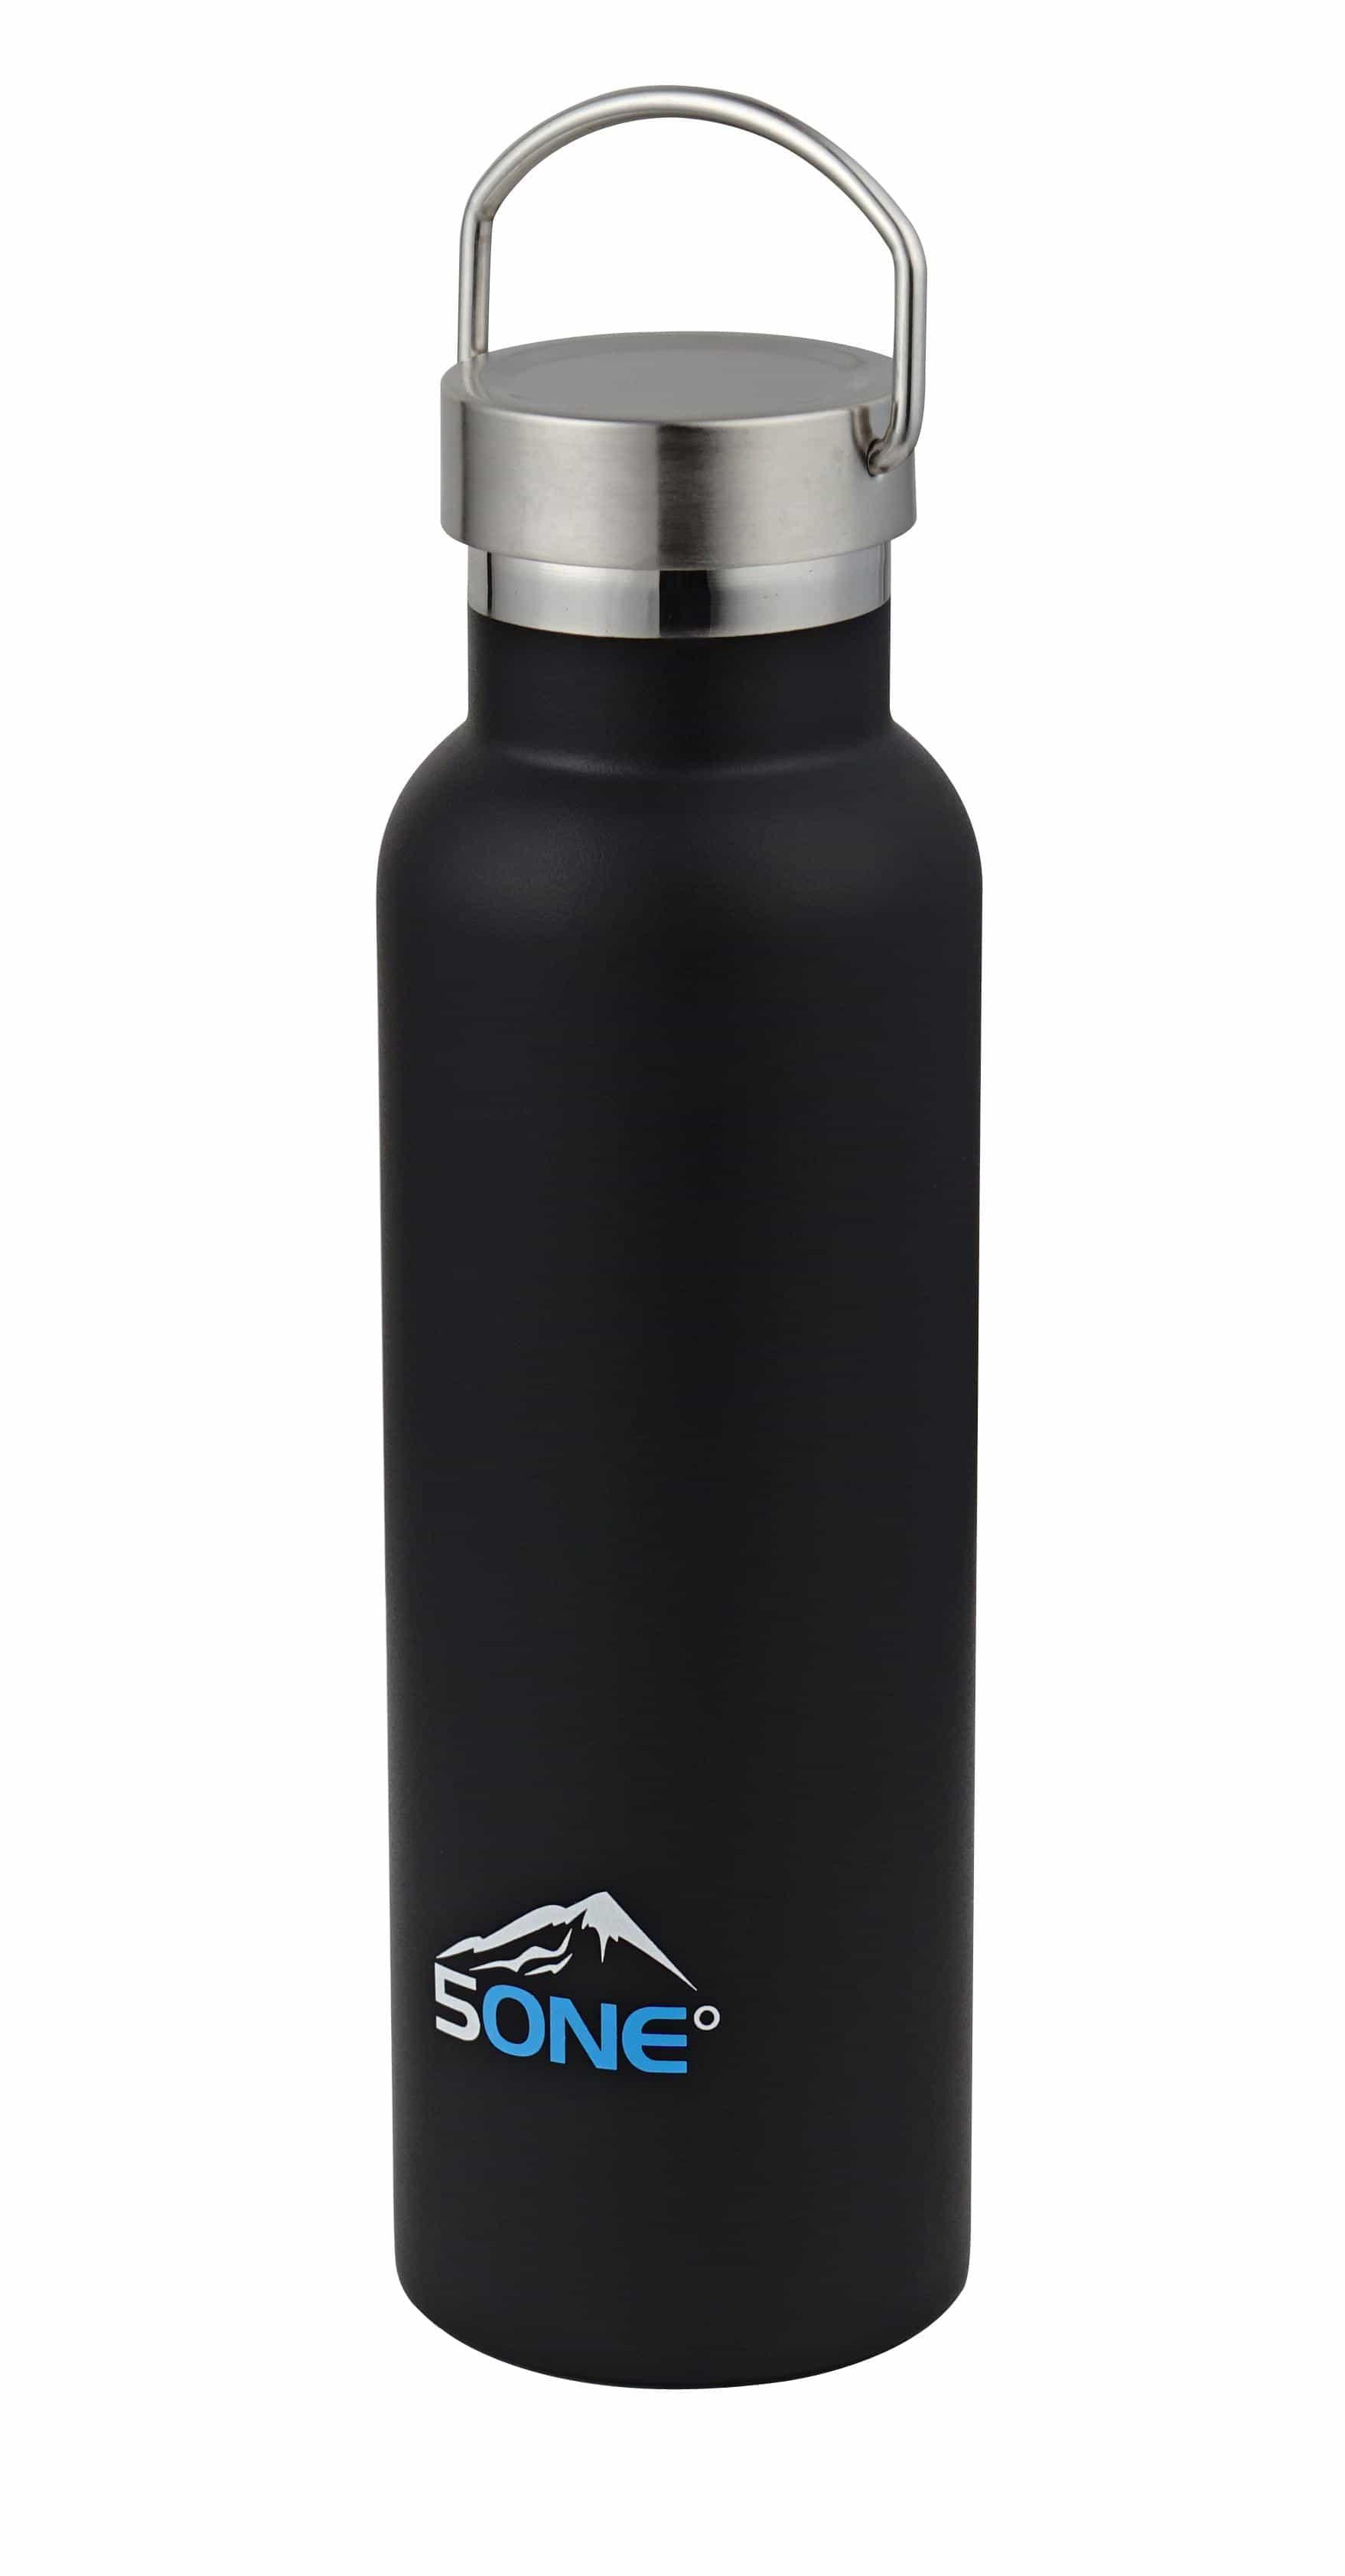 5one® dubbelwandige koelfles thermosfles 600ml